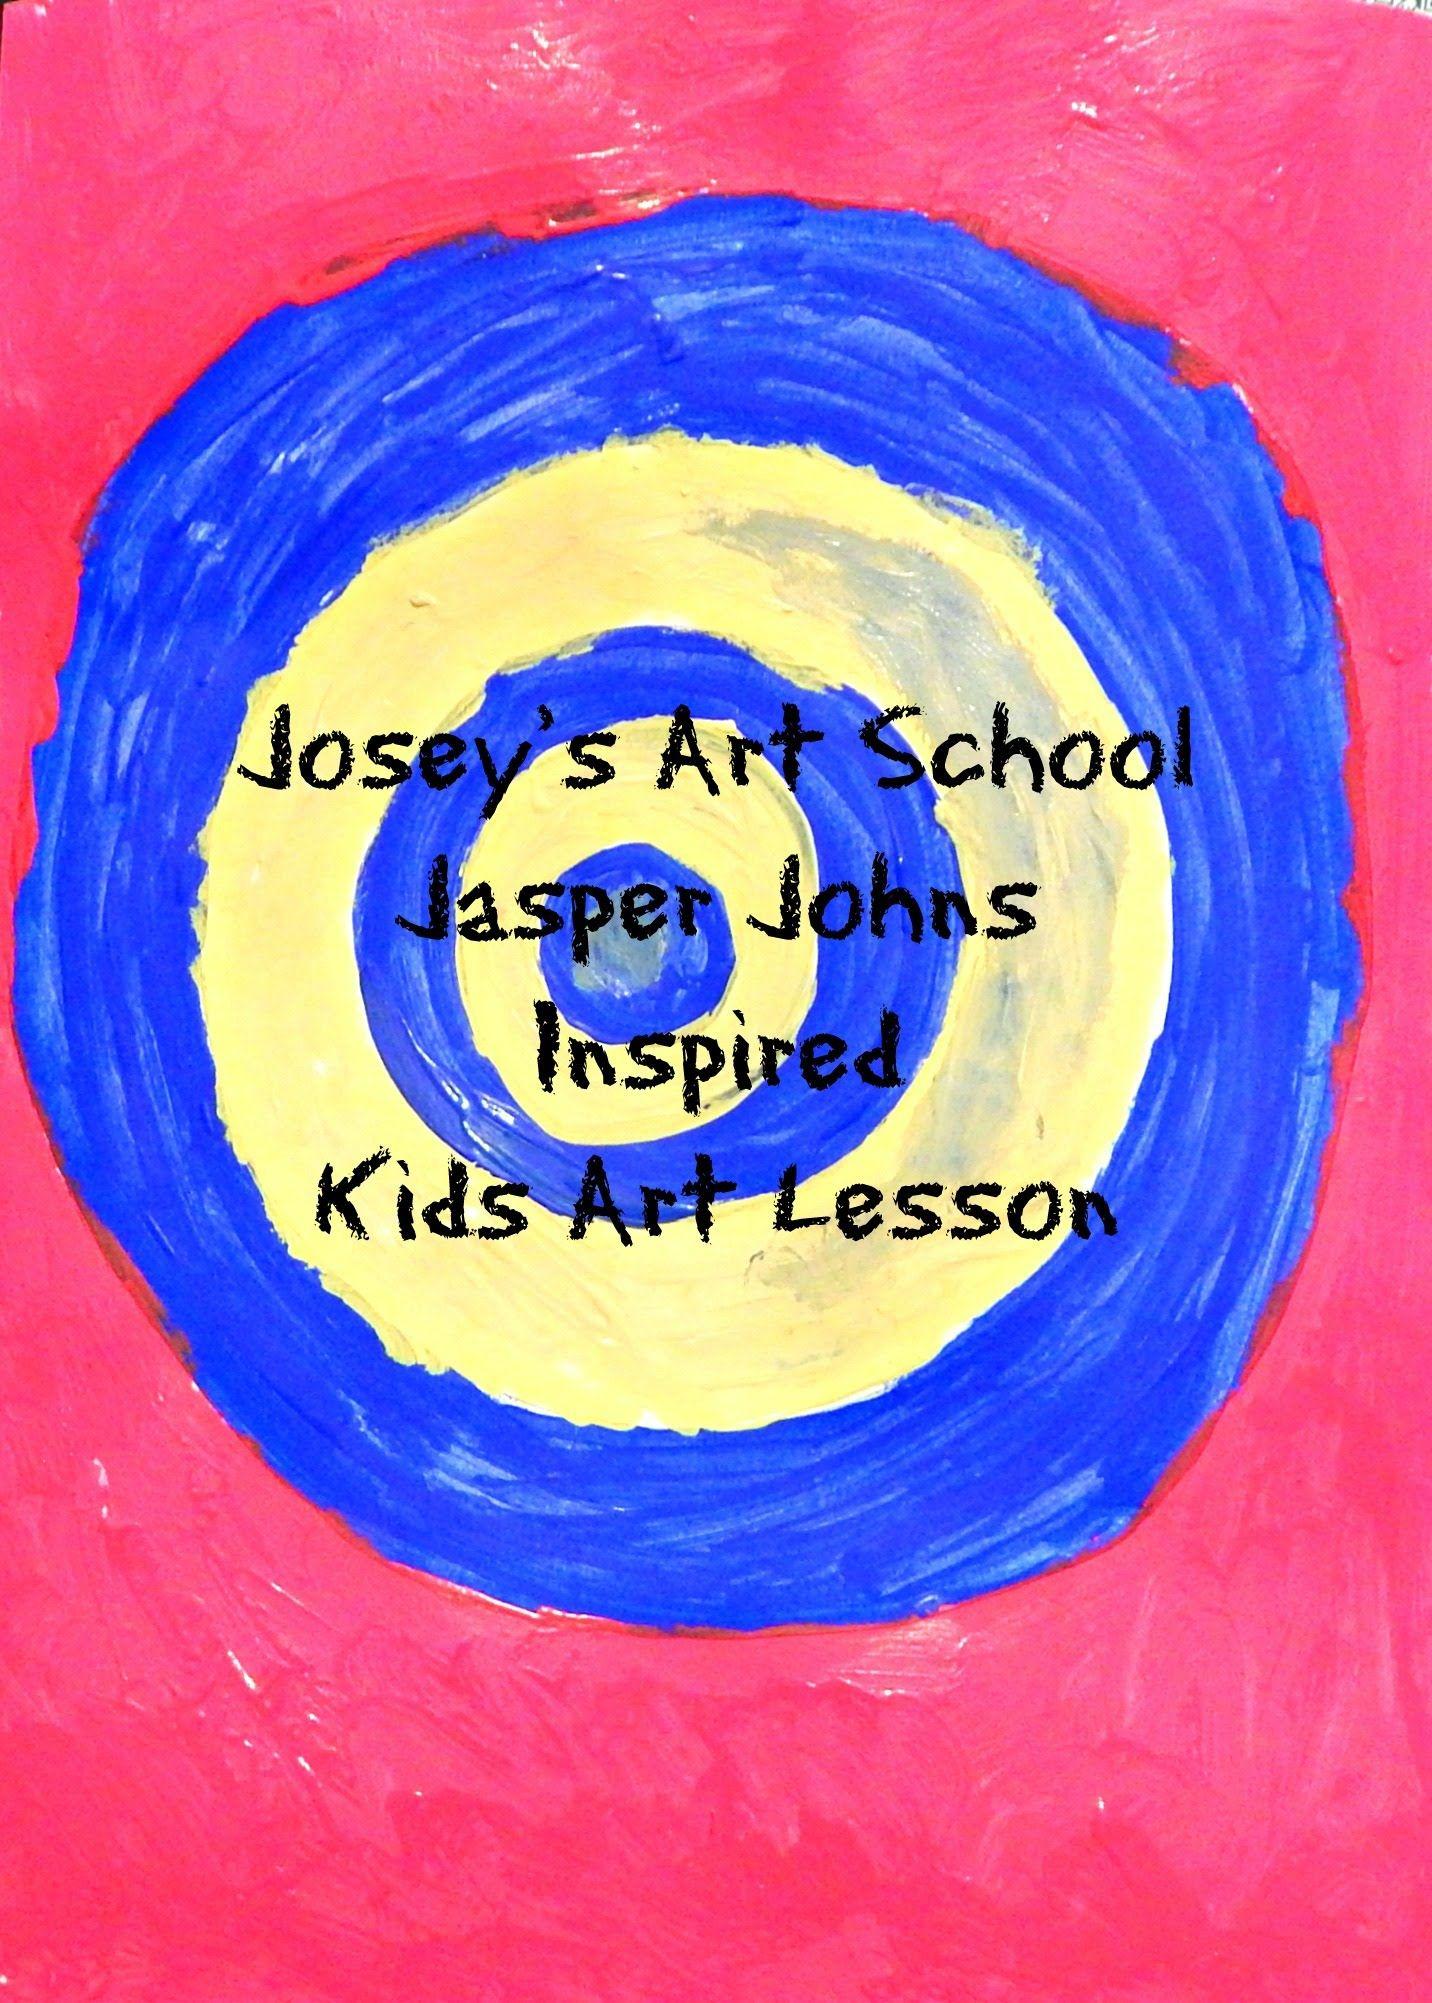 Joseys art school episode 87 jasper johns target kids art